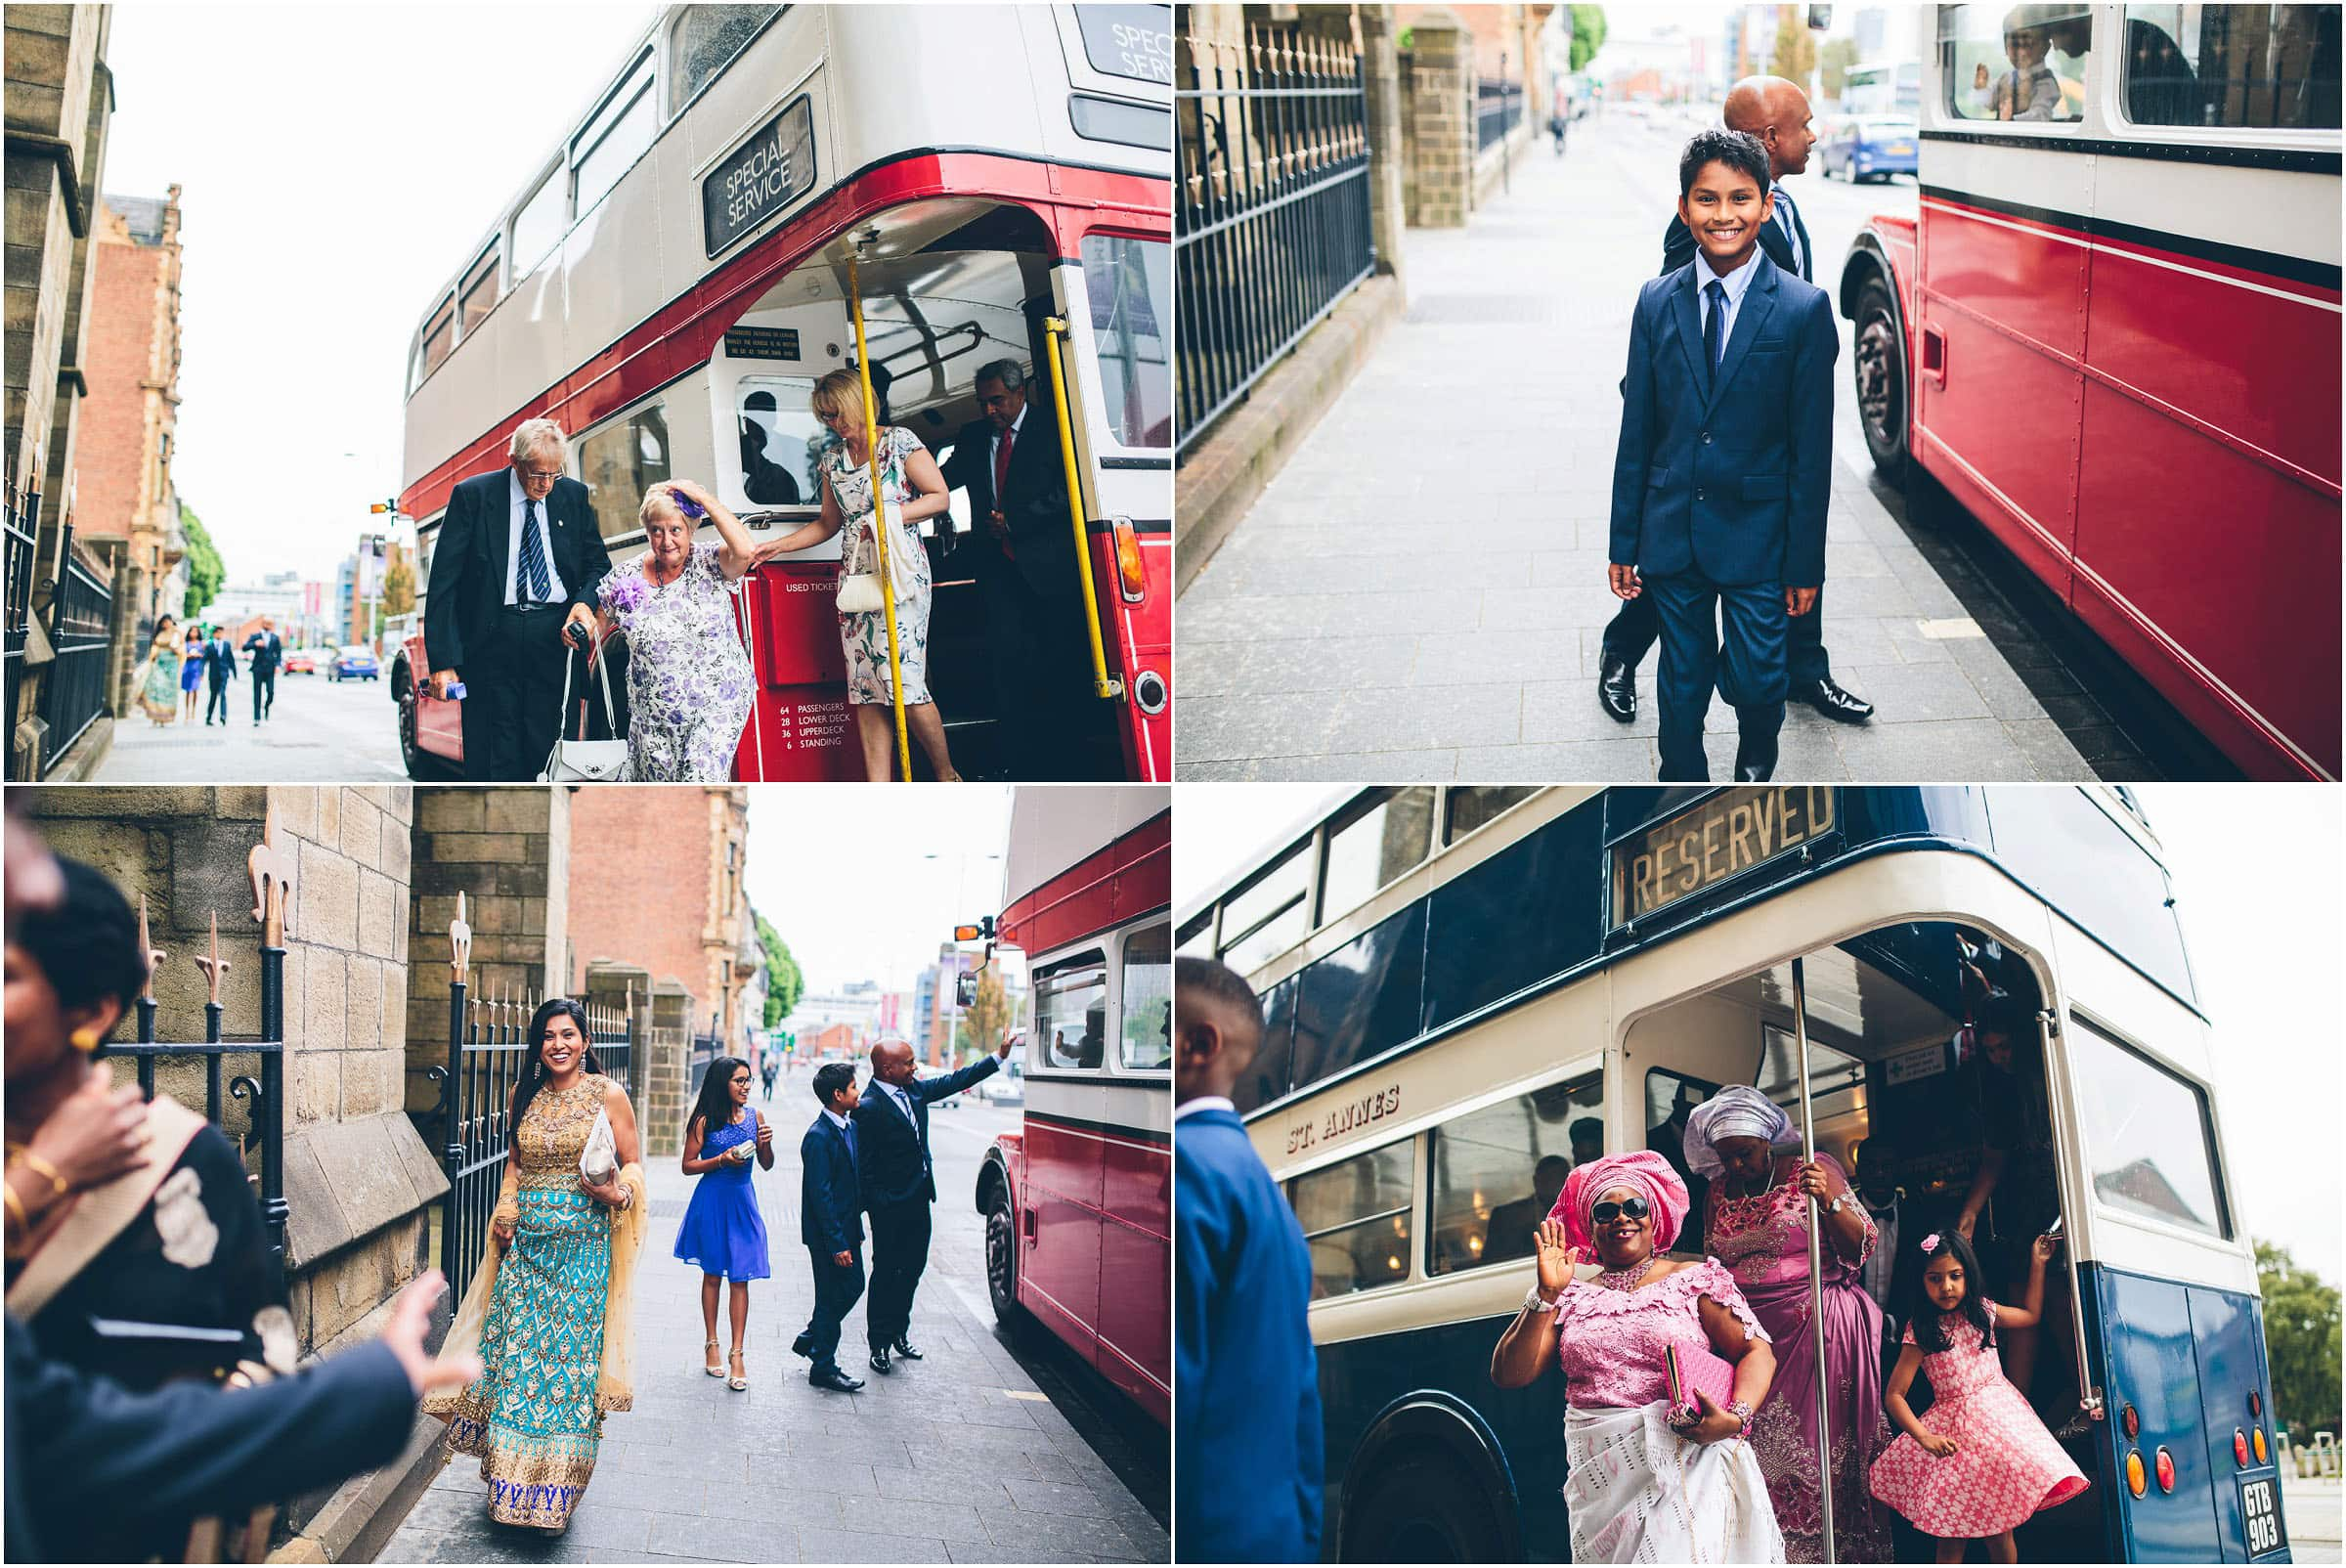 Hilton_Manchester_Wedding_Photography_0039